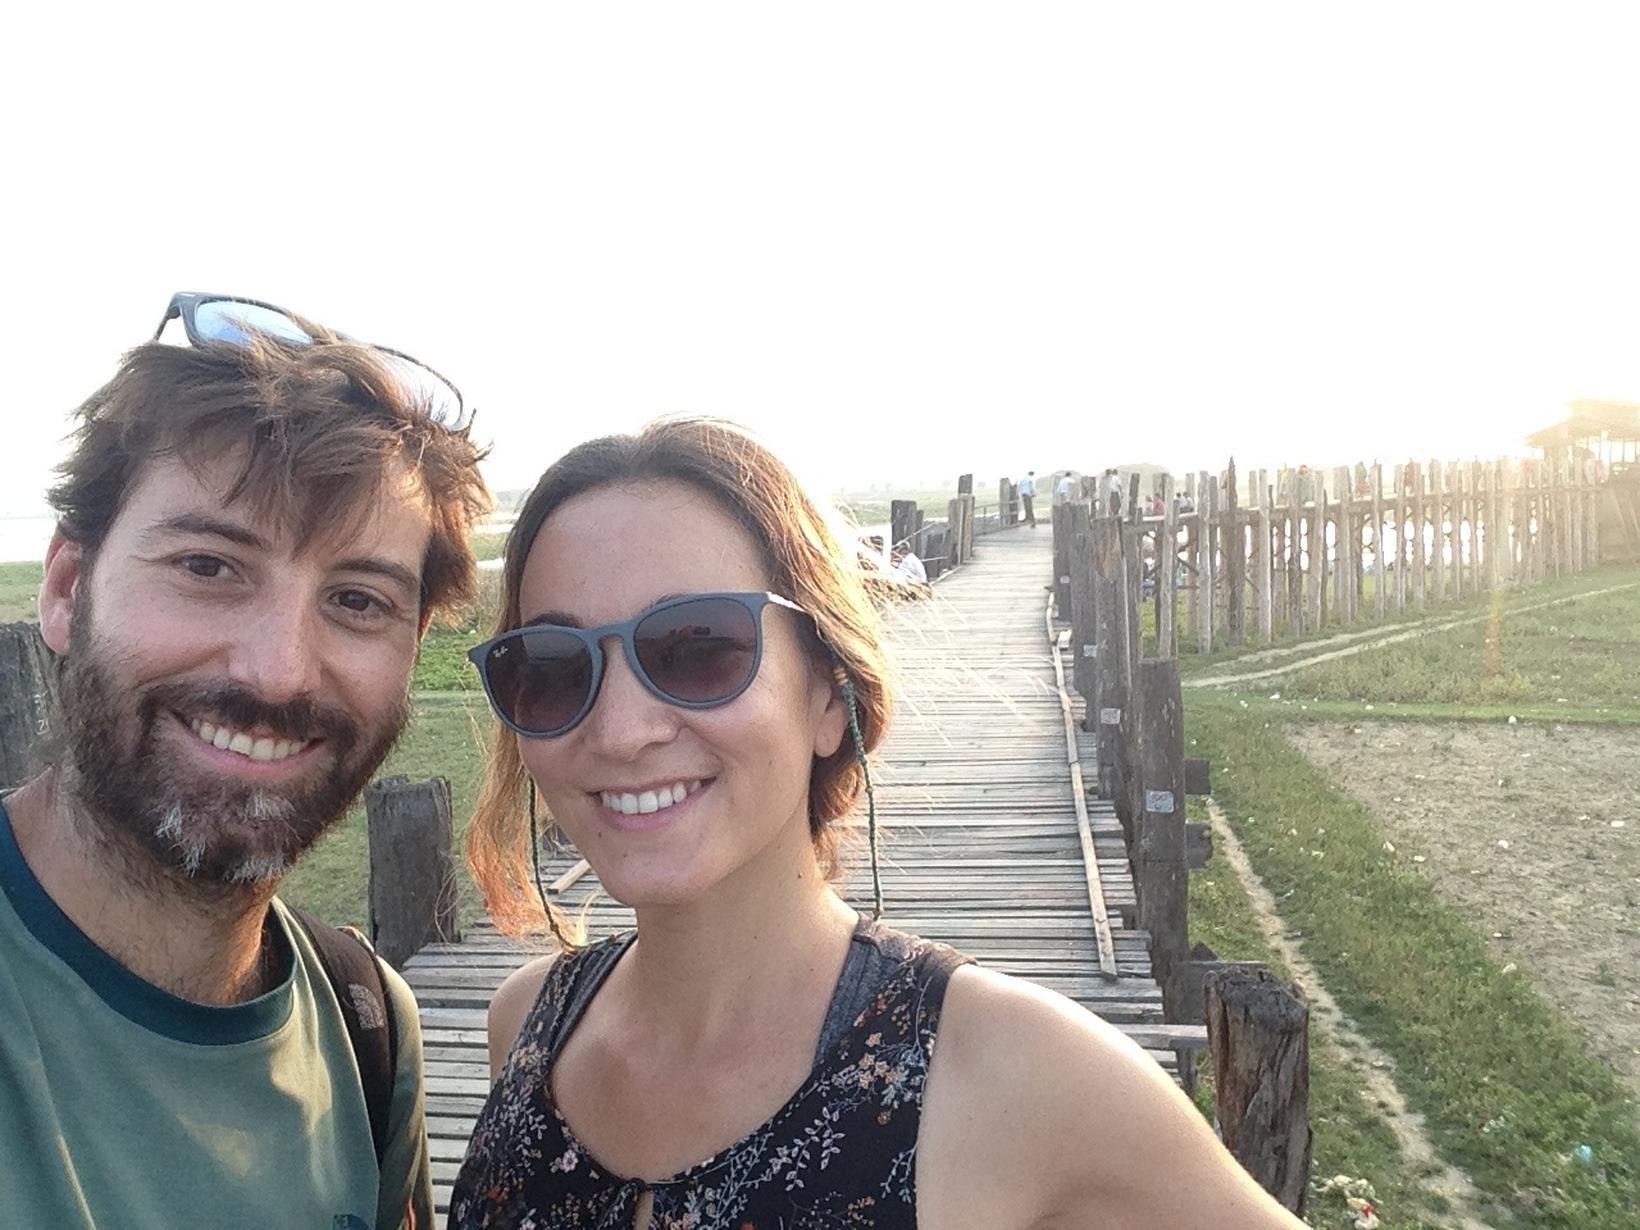 Laura & Jordi from Barcelona, Spain